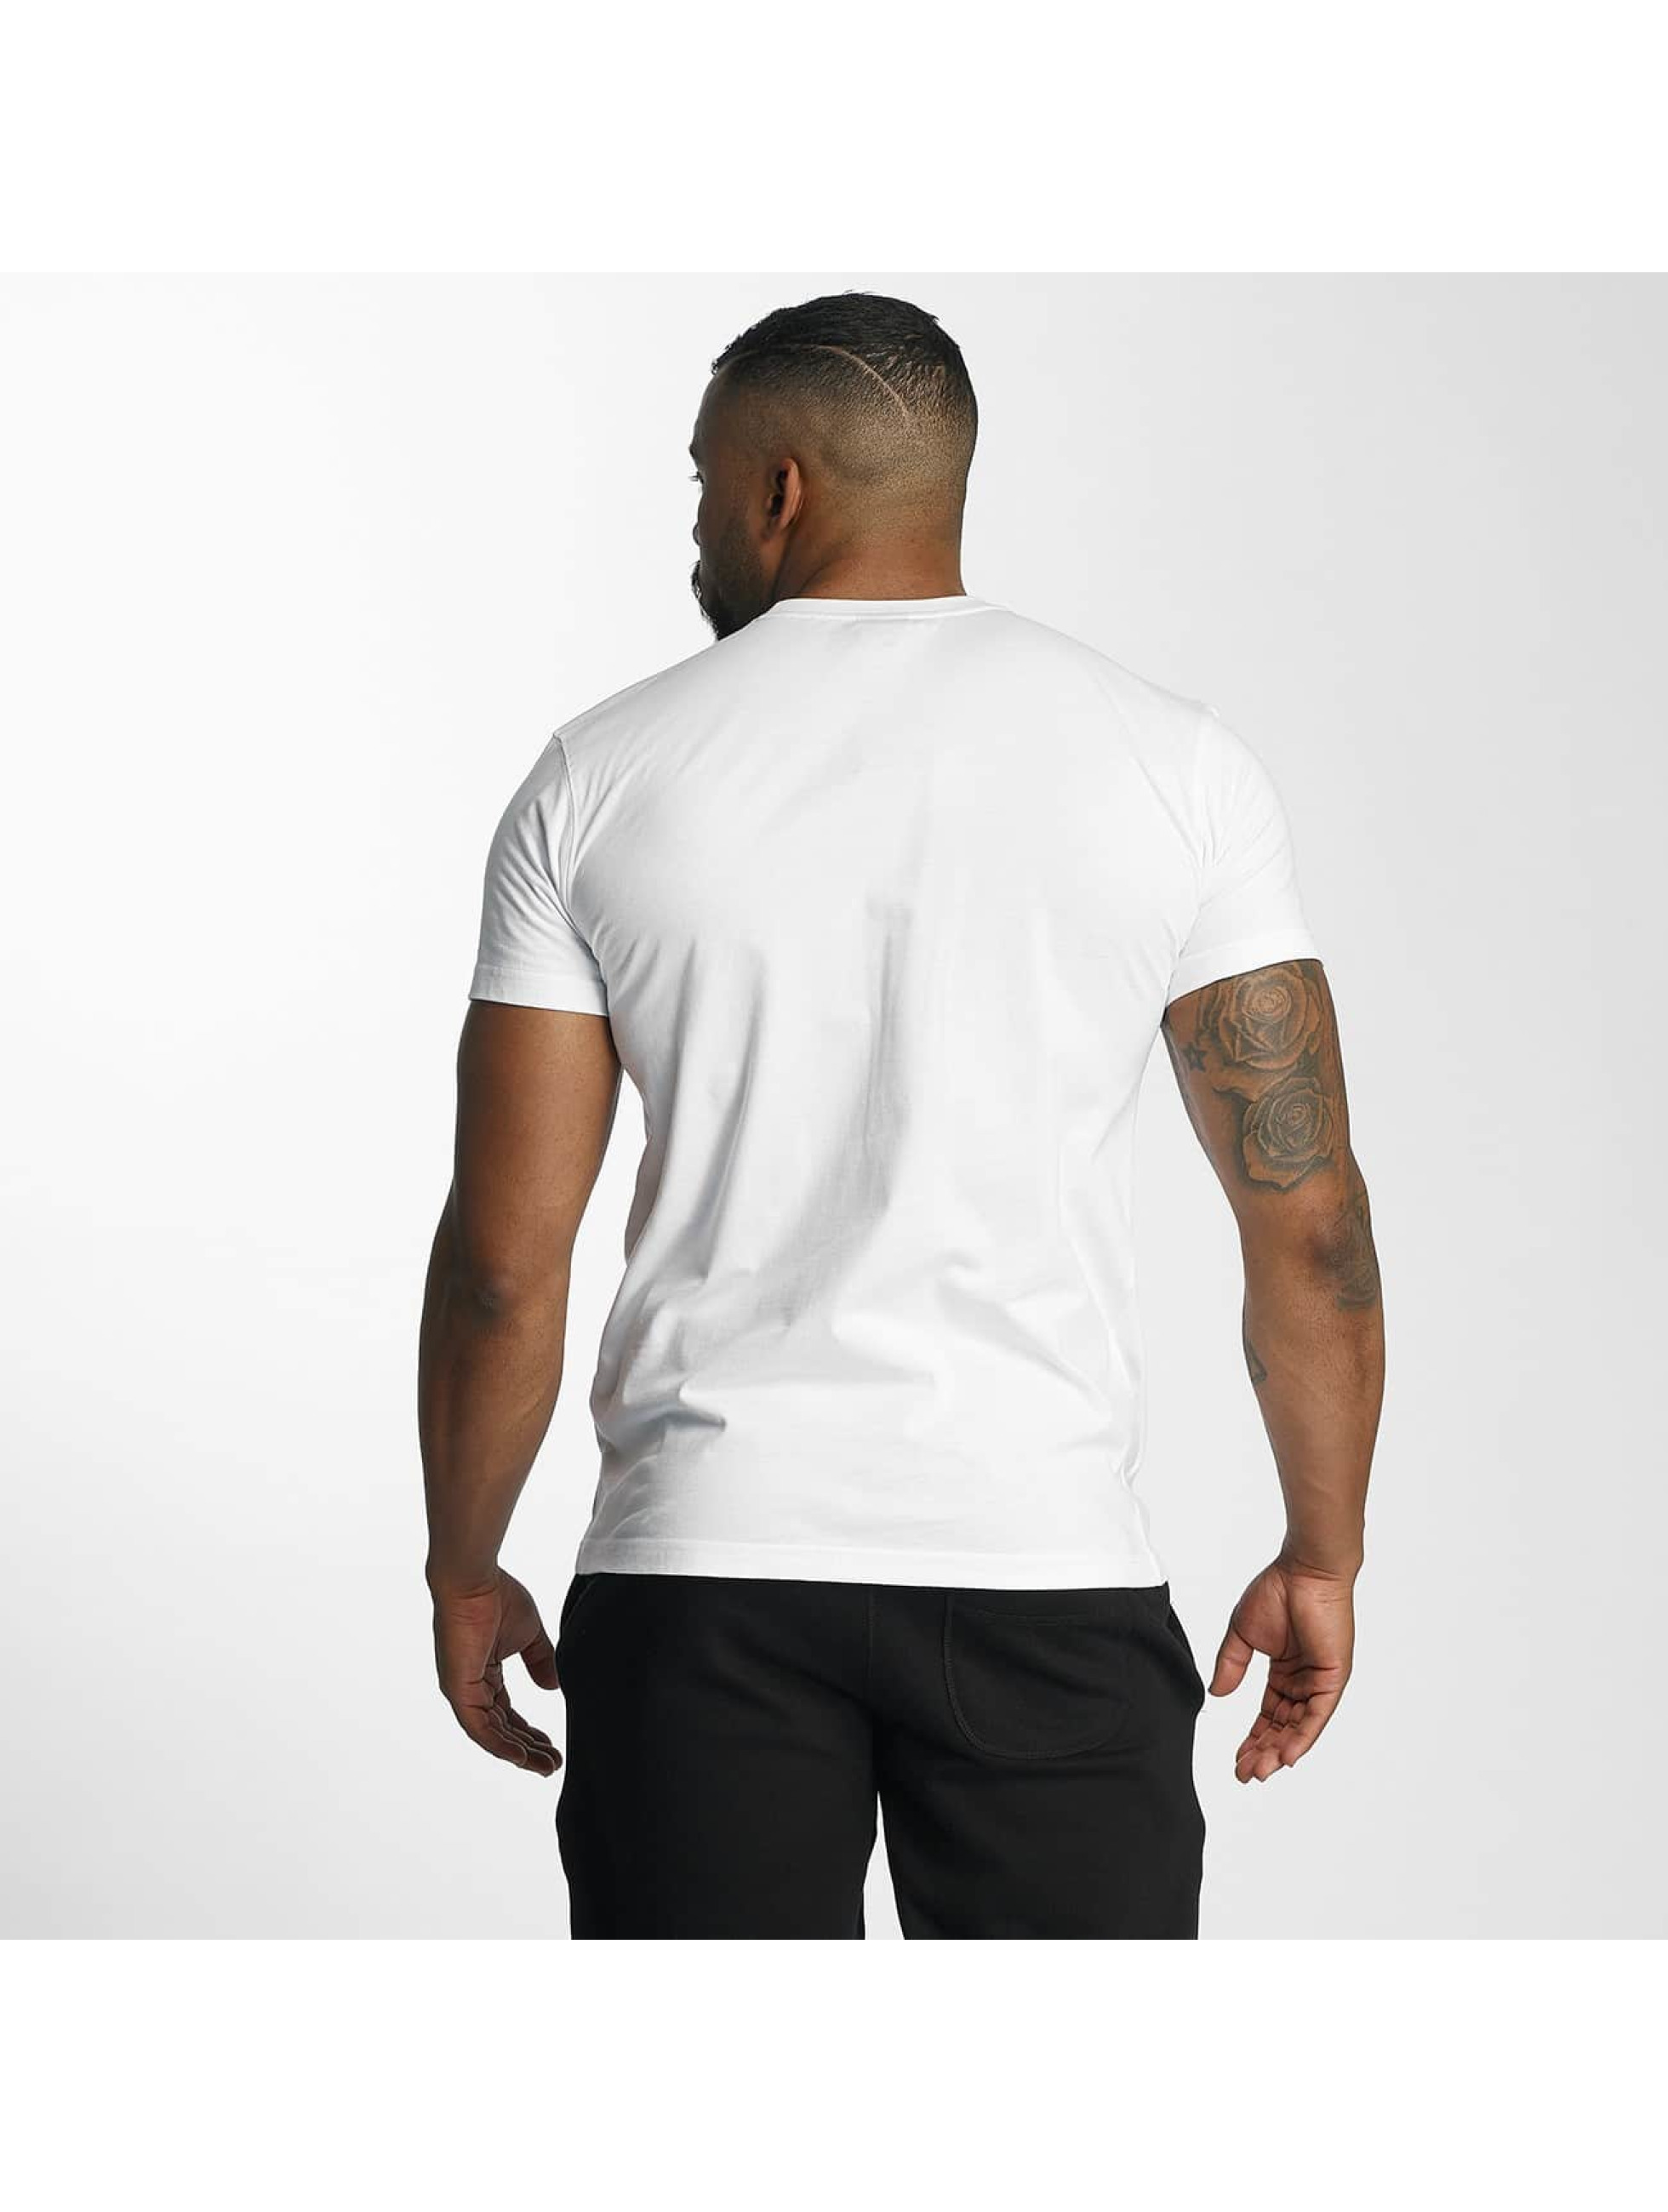 Pusher Apparel t-shirt White Carrera wit